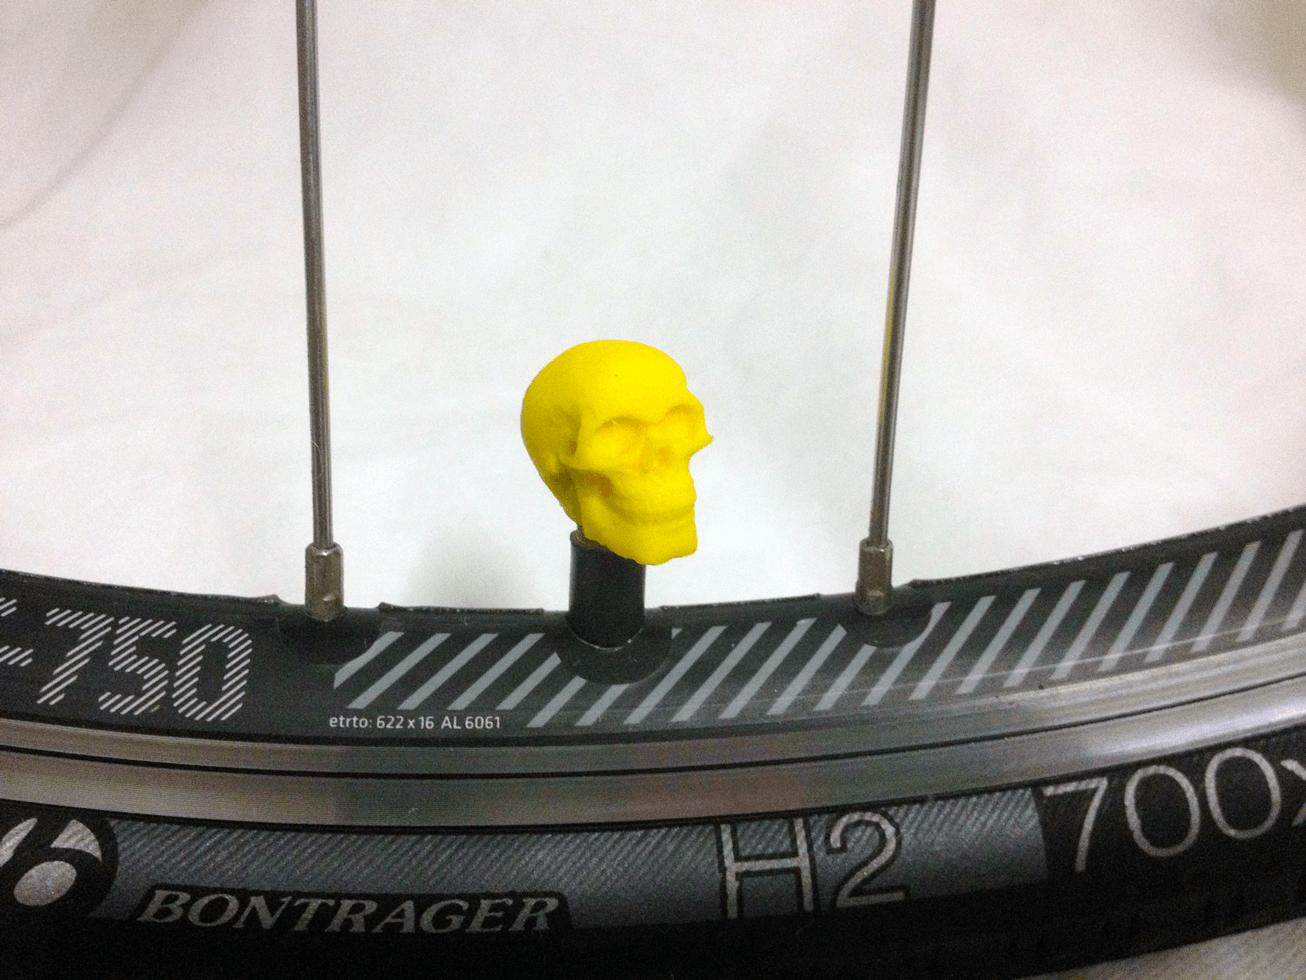 bike-skull-yellow.png Download STL file Skull Head Car Truck Bike Van Tire Tyre Wheel Valve Stem Caps Cover • Template to 3D print, Custom3DPrinting